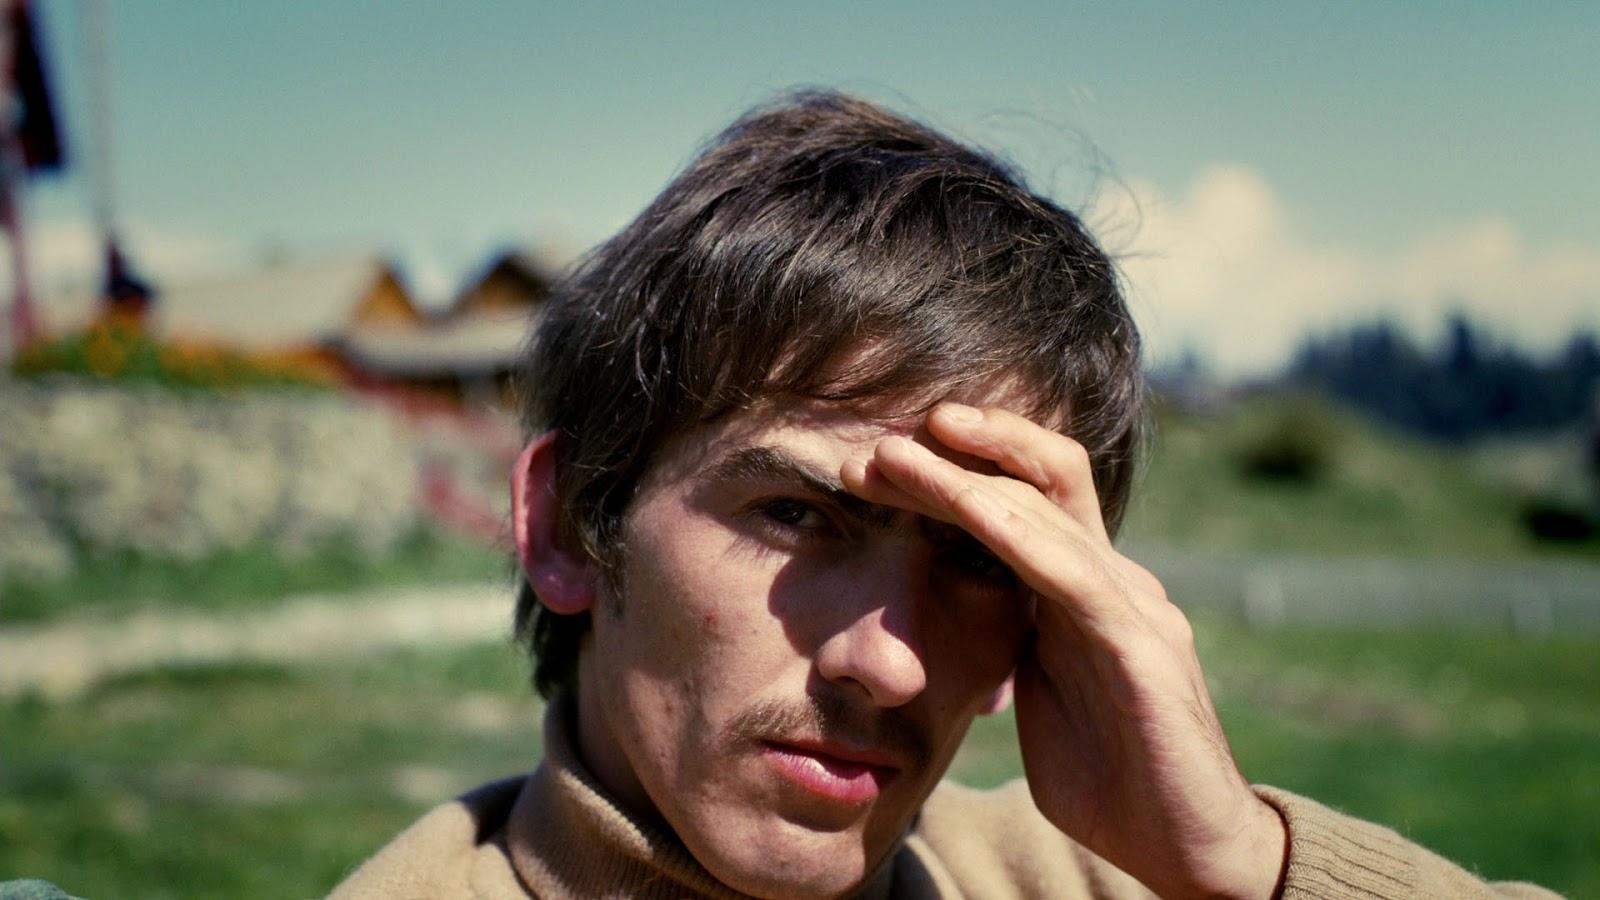 george harrison 1966 - photo #3